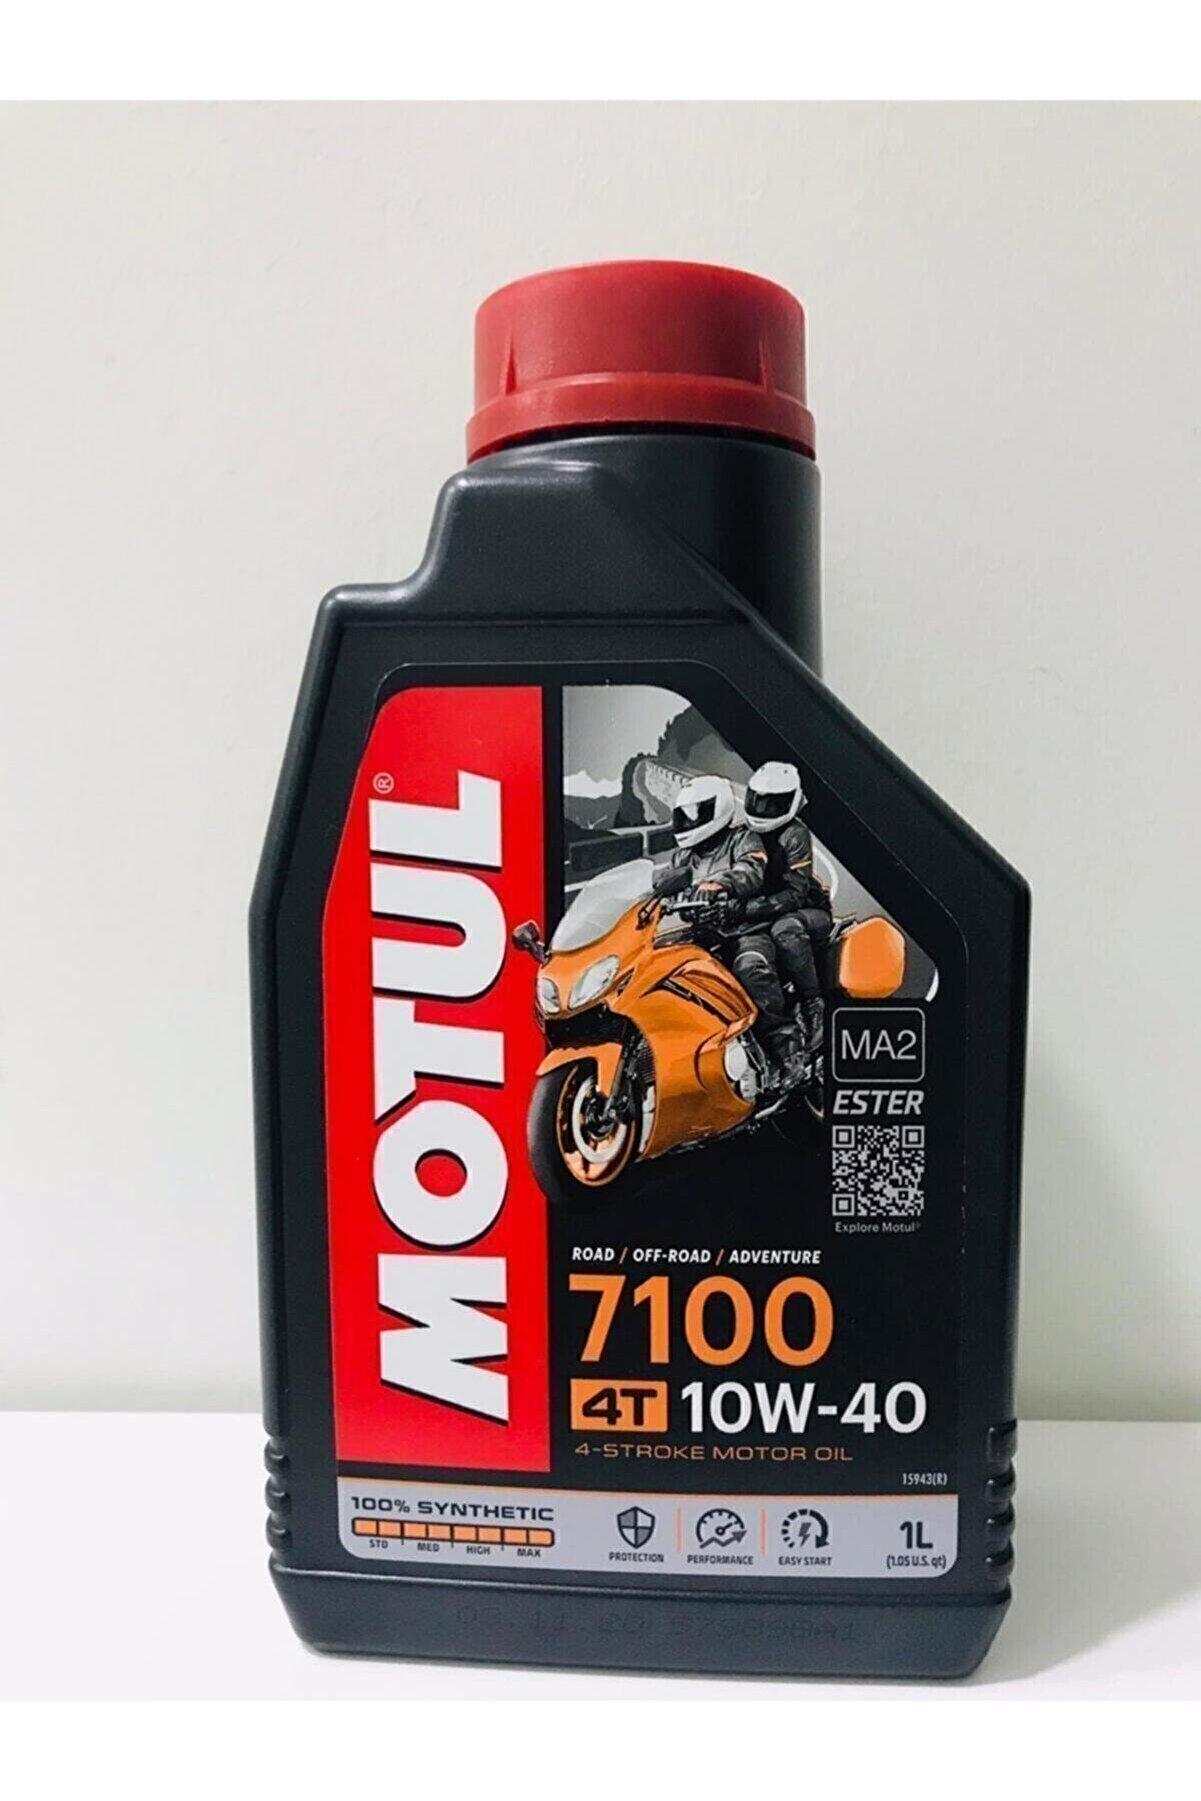 Motul 7100 10w40 4t 1 Litre Motosiklet Yağı